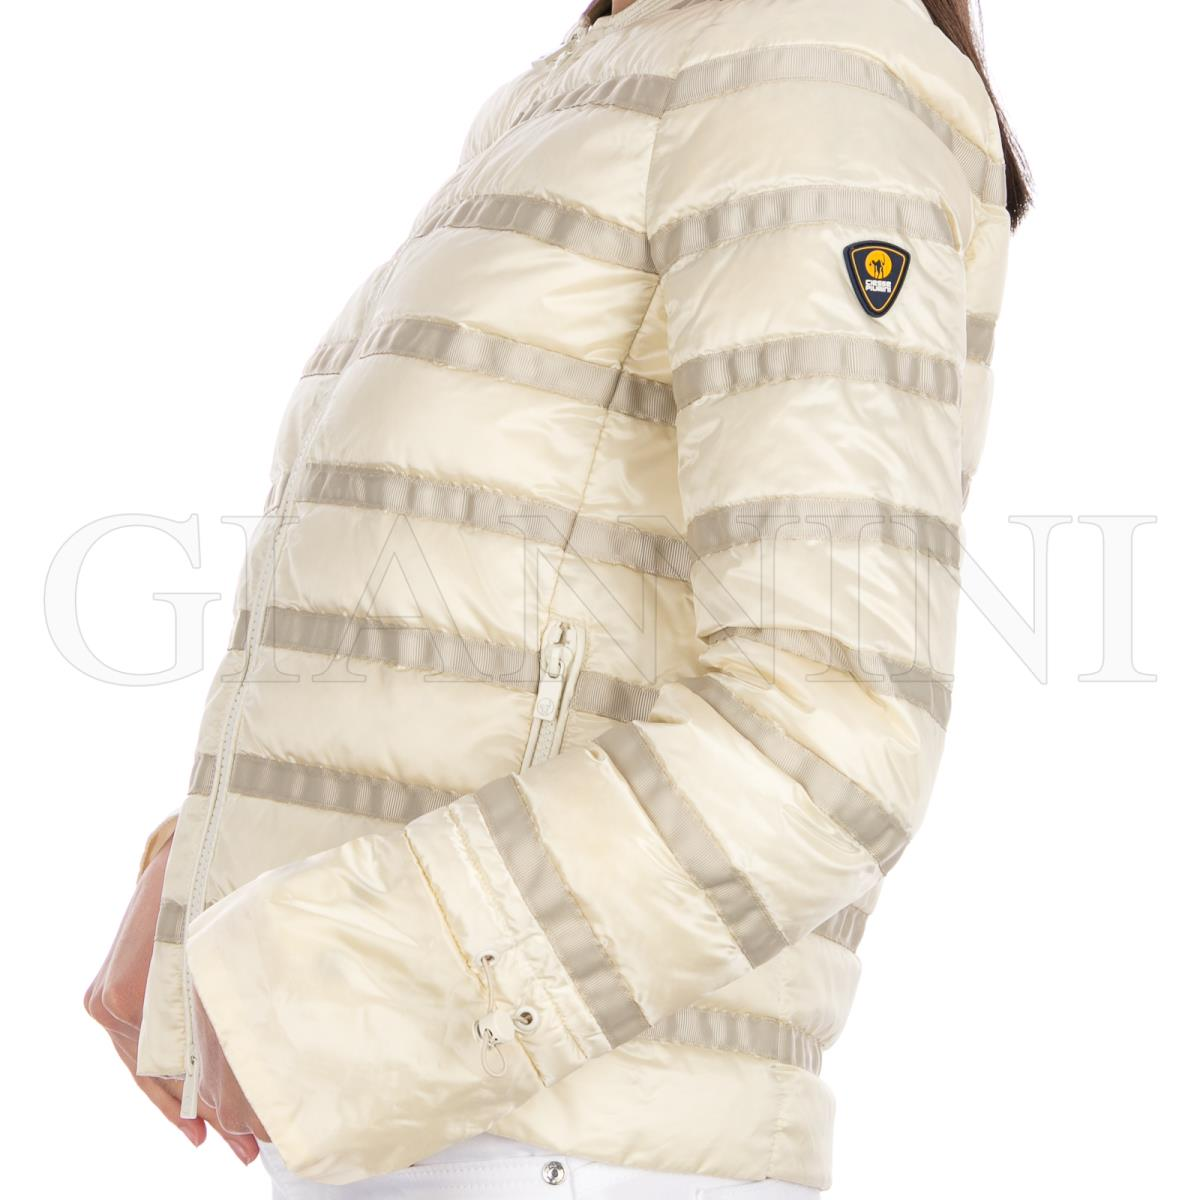 newest collection 286f8 59c84 Ciesse Piumini Giubbotto 195cfwj22079 n4410d | Giannini Shop ...